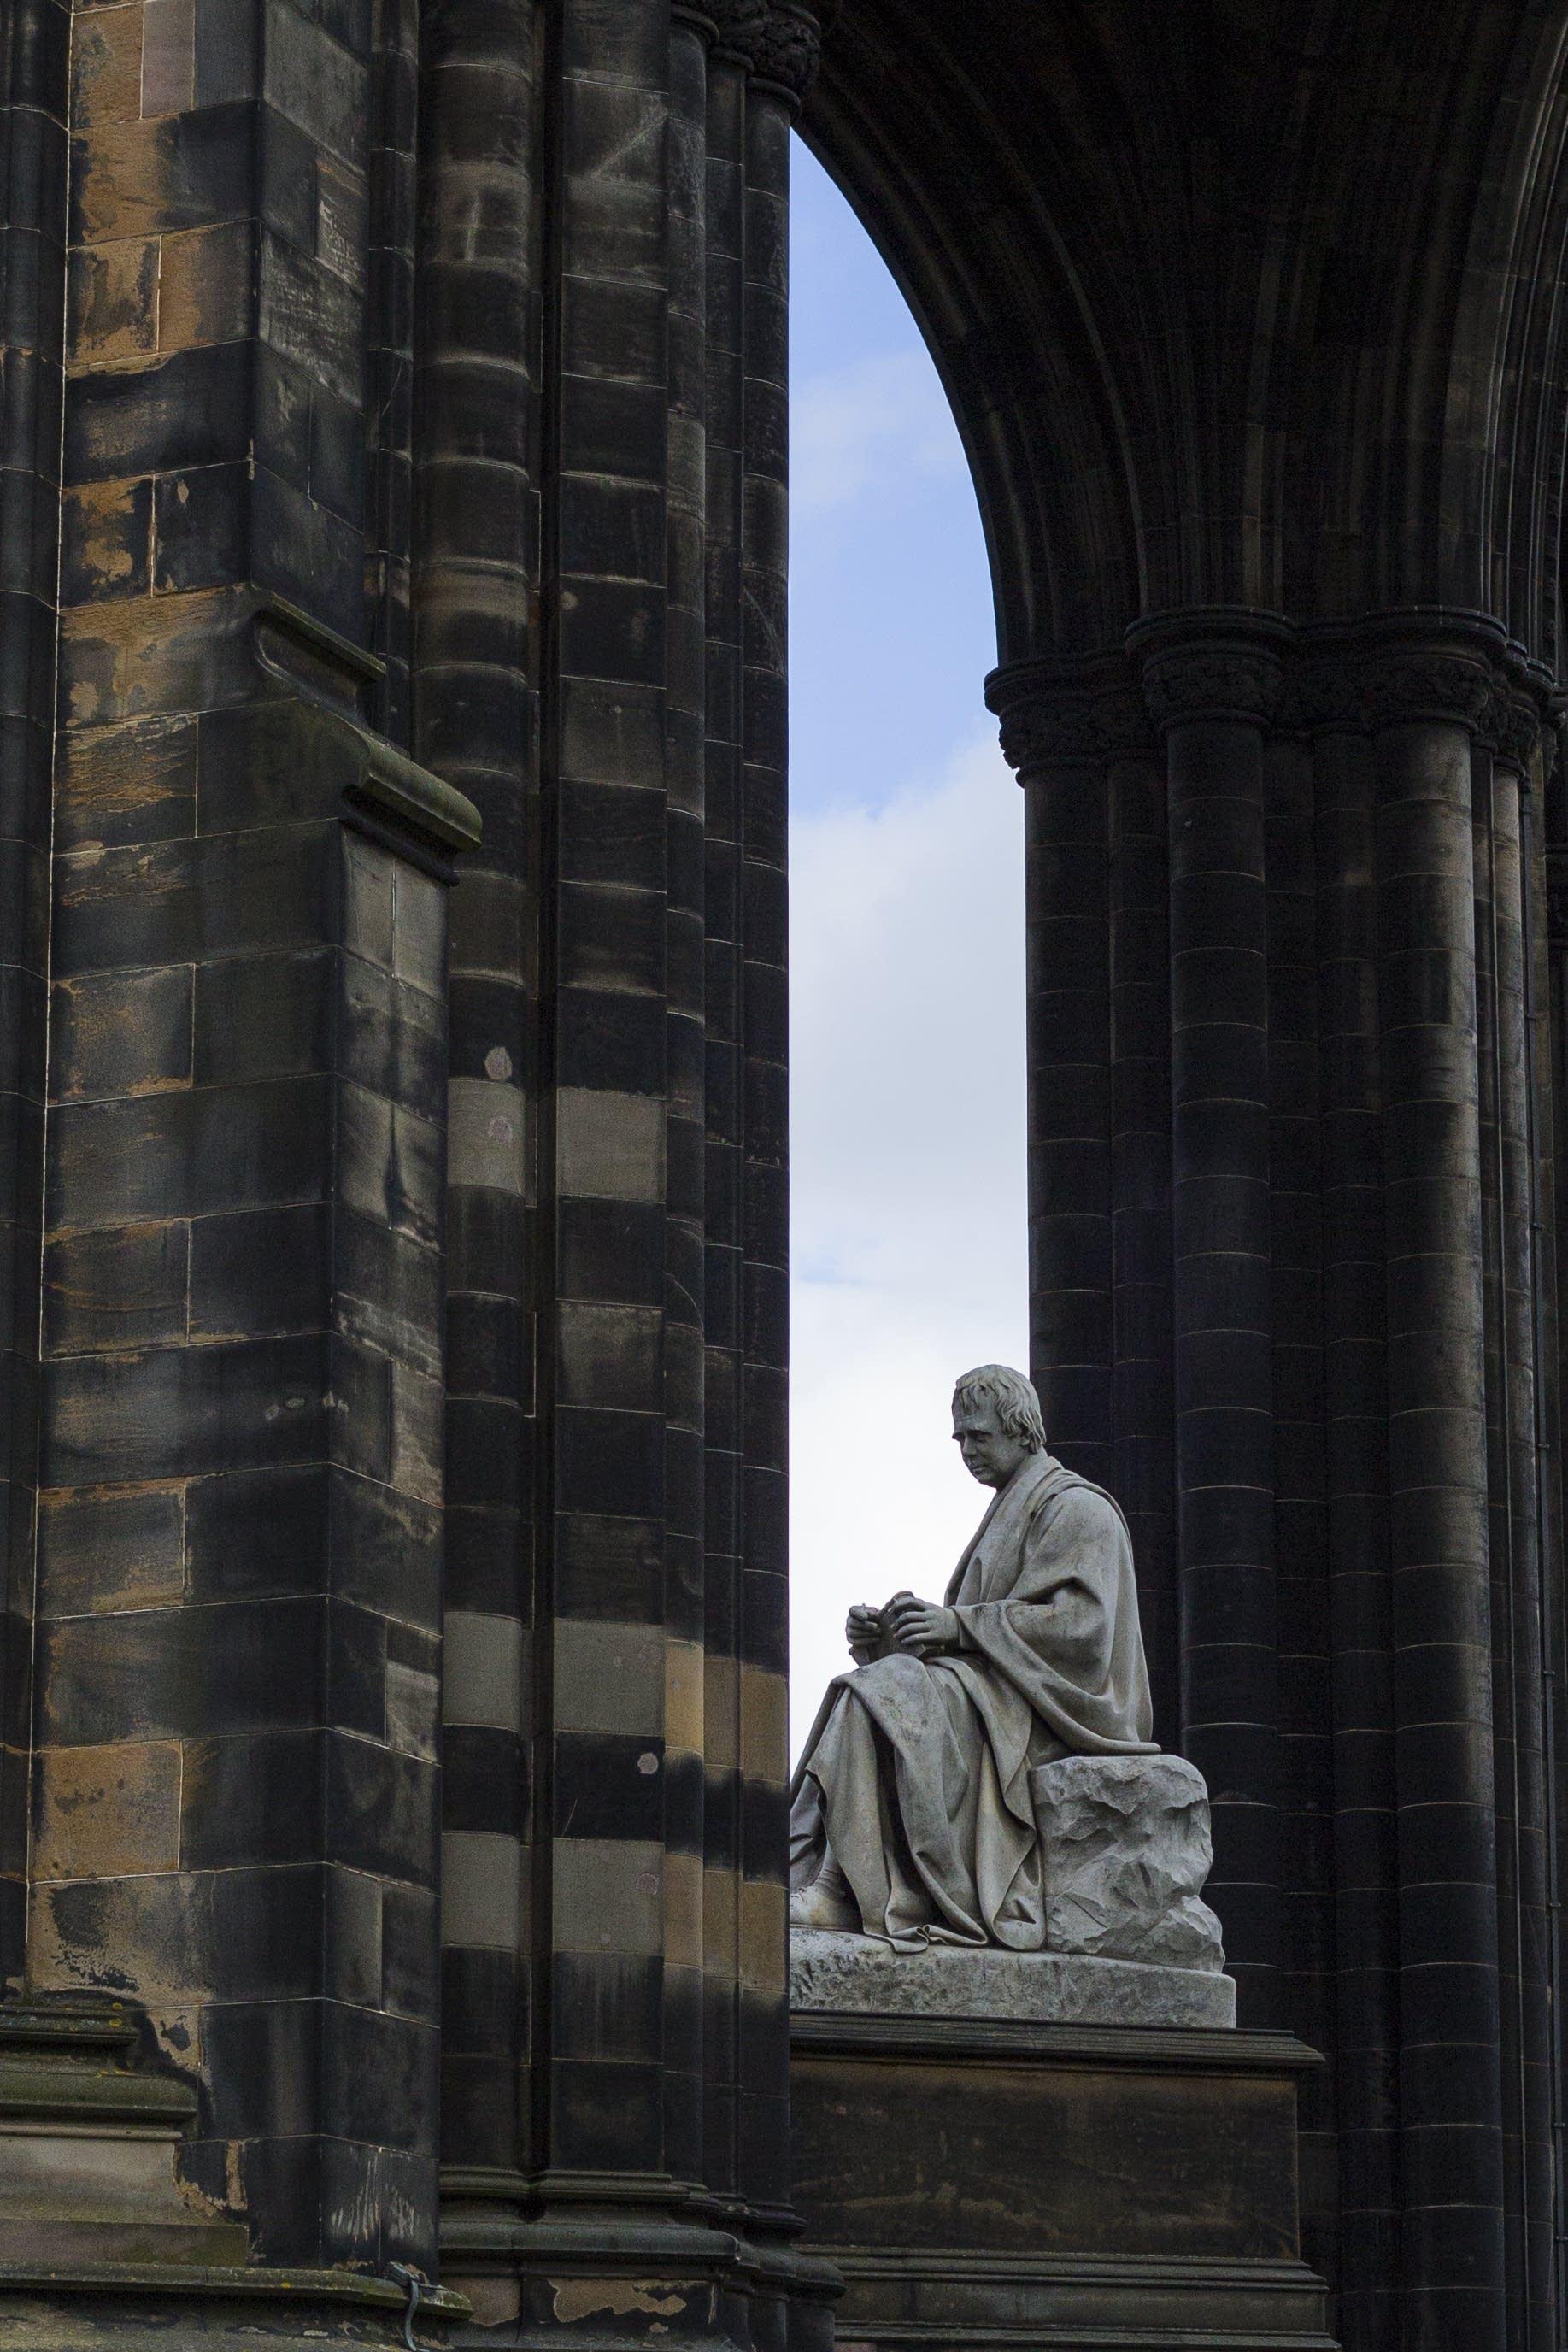 Edinburgh - 41 - Walter Scott